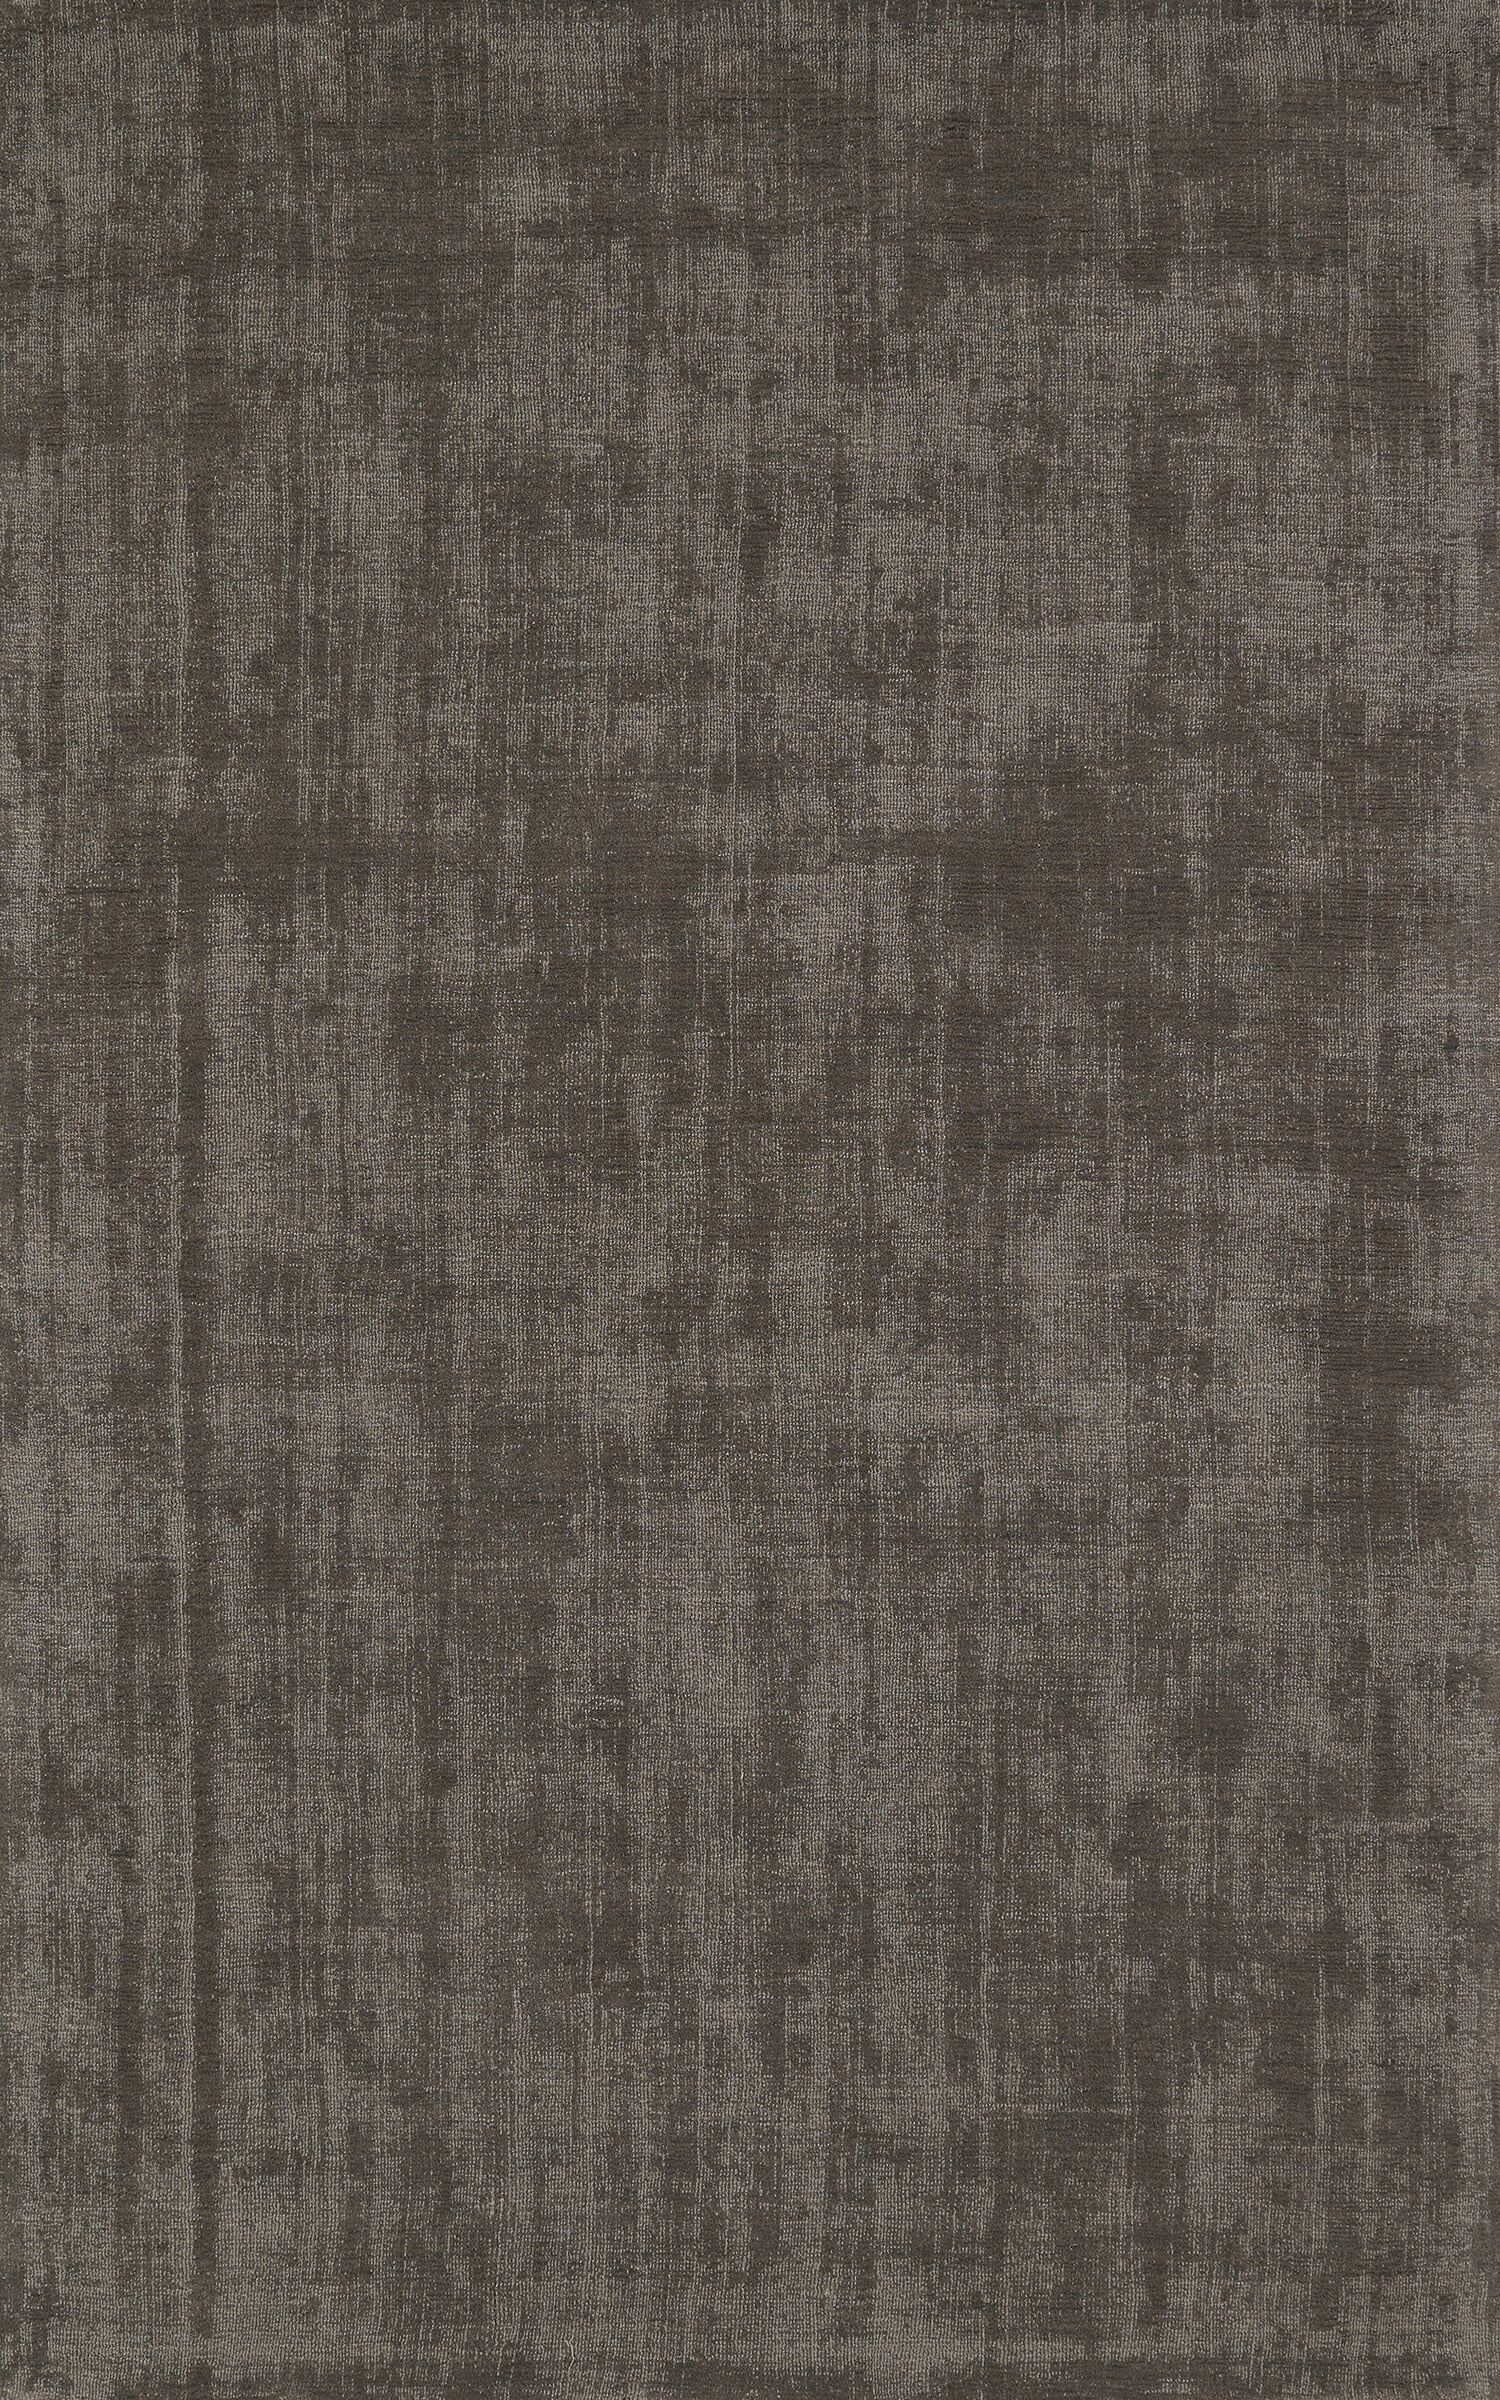 Tasha Stone Area Rug Rug Size: 5' x 7'6